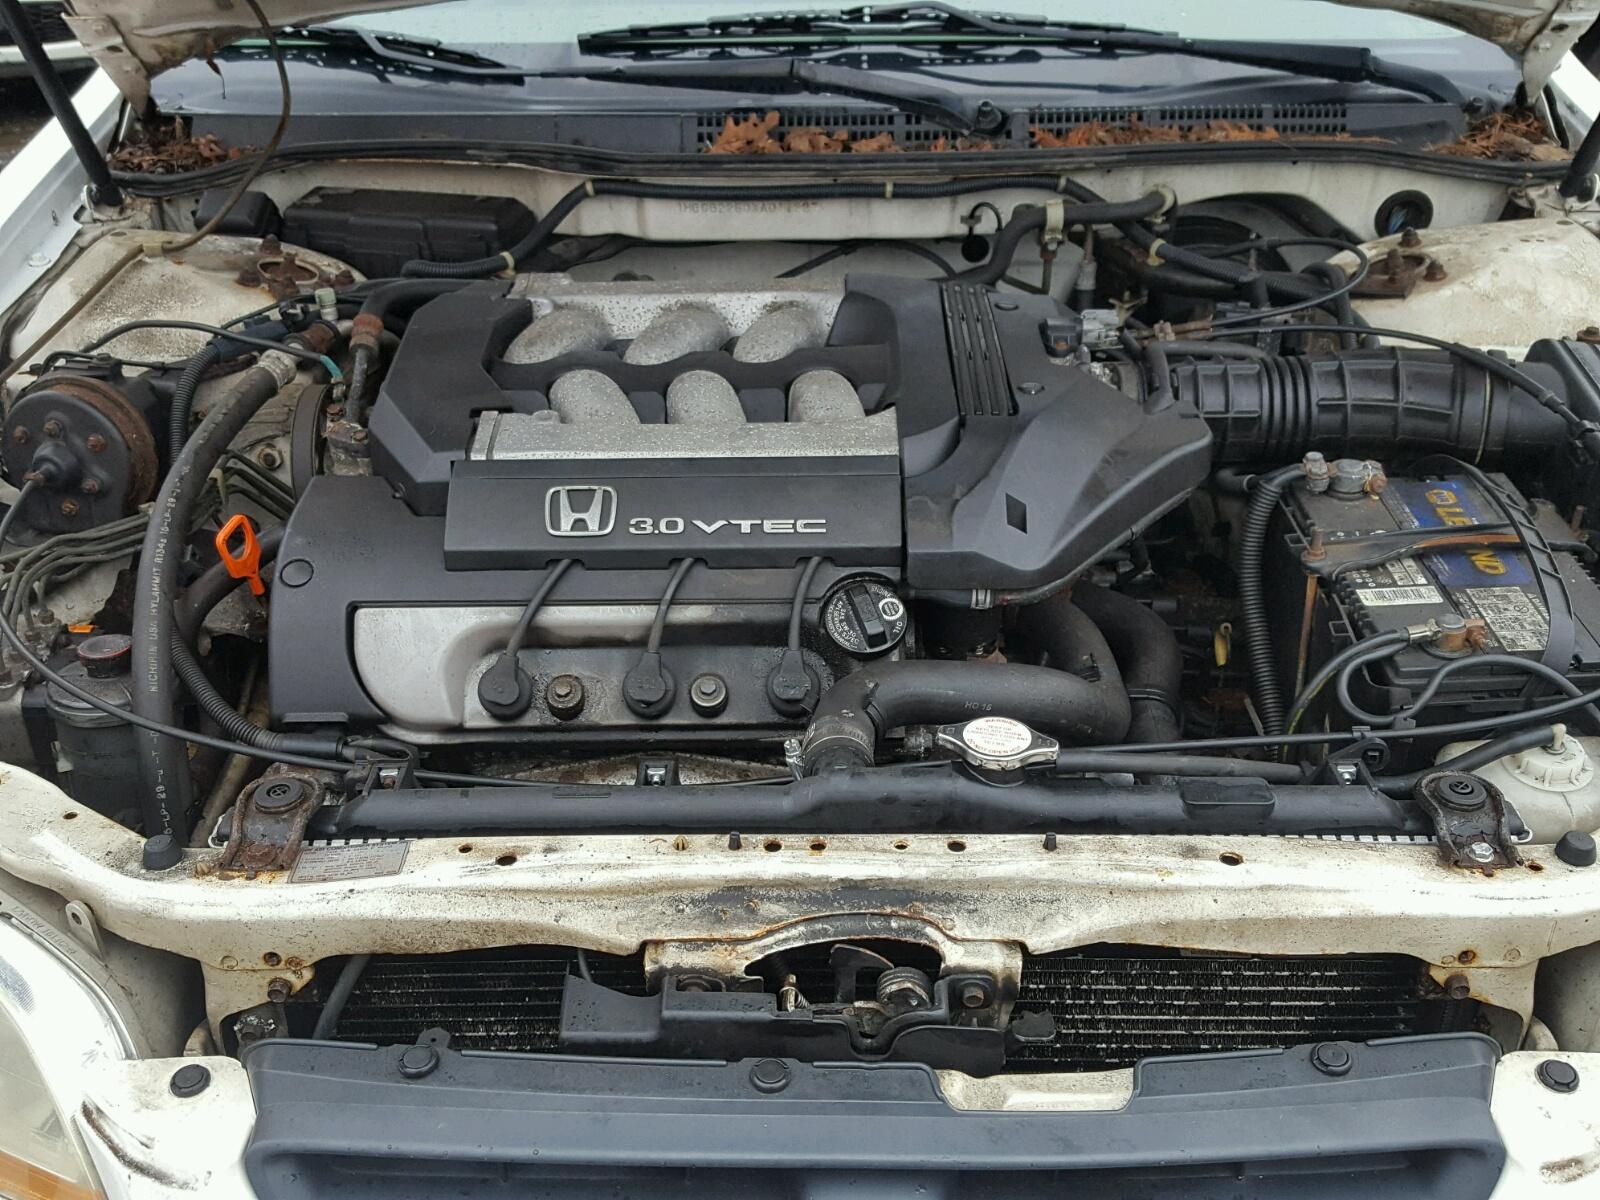 1999 Honda Accord Engine Vtec Xa White Ex On Sale In Ma North 1600x1200